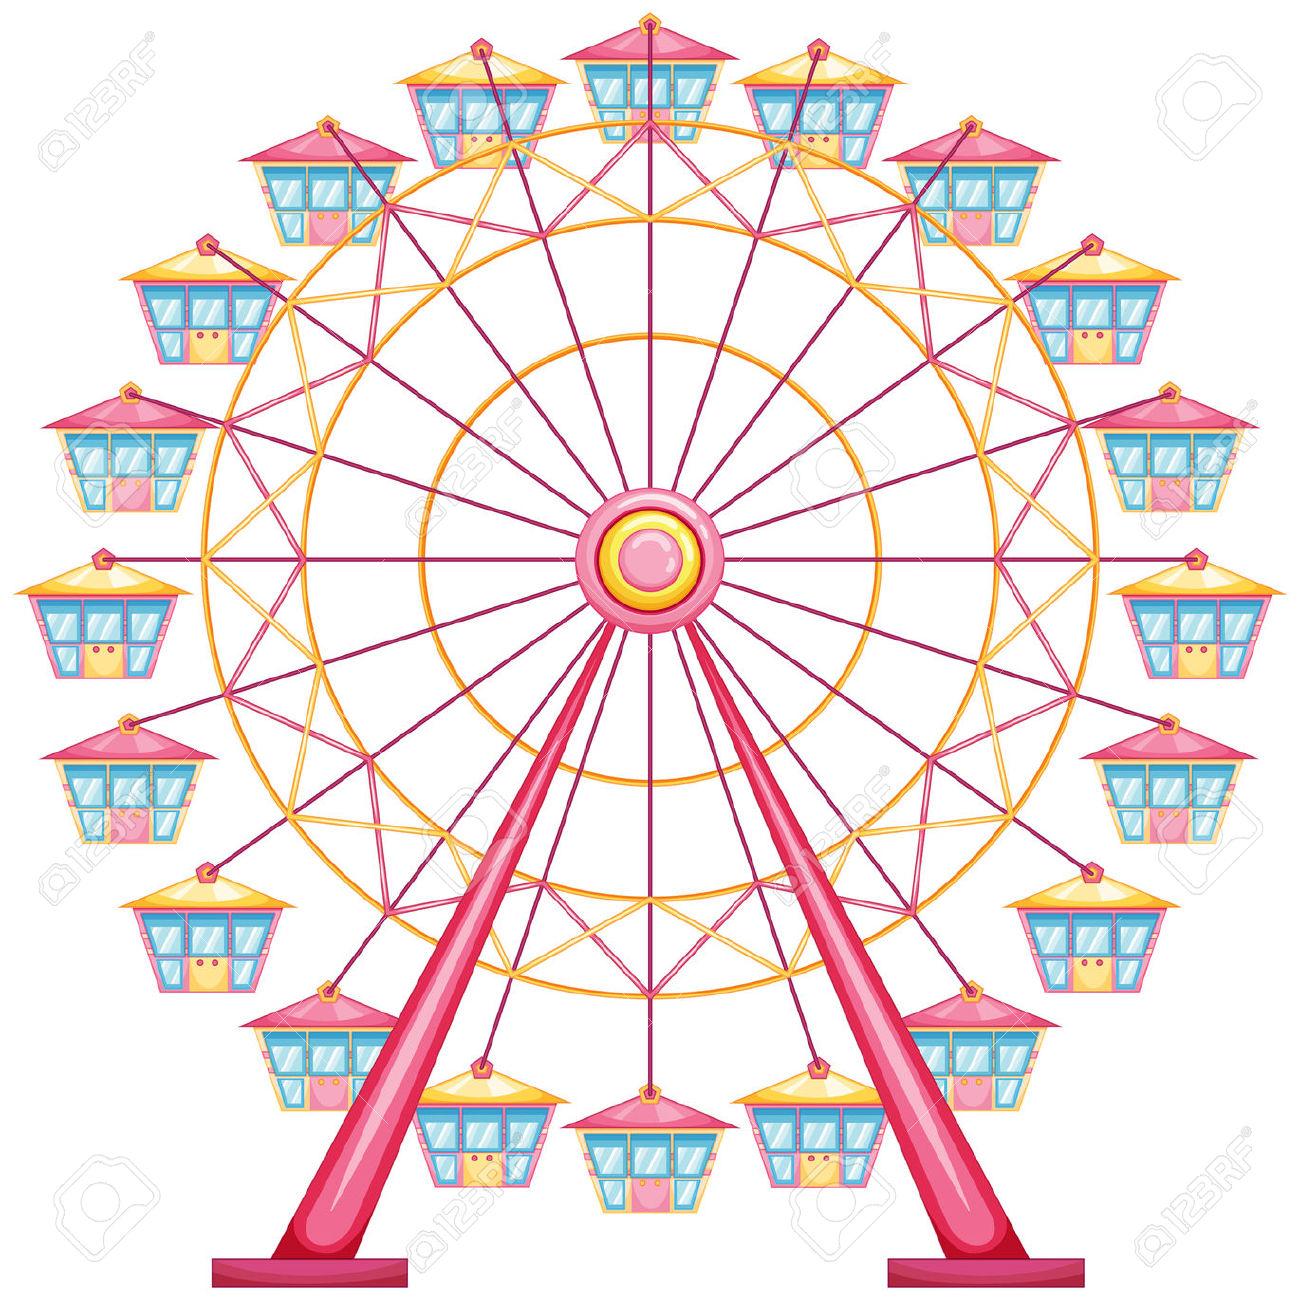 Ferris wheel clipart 2